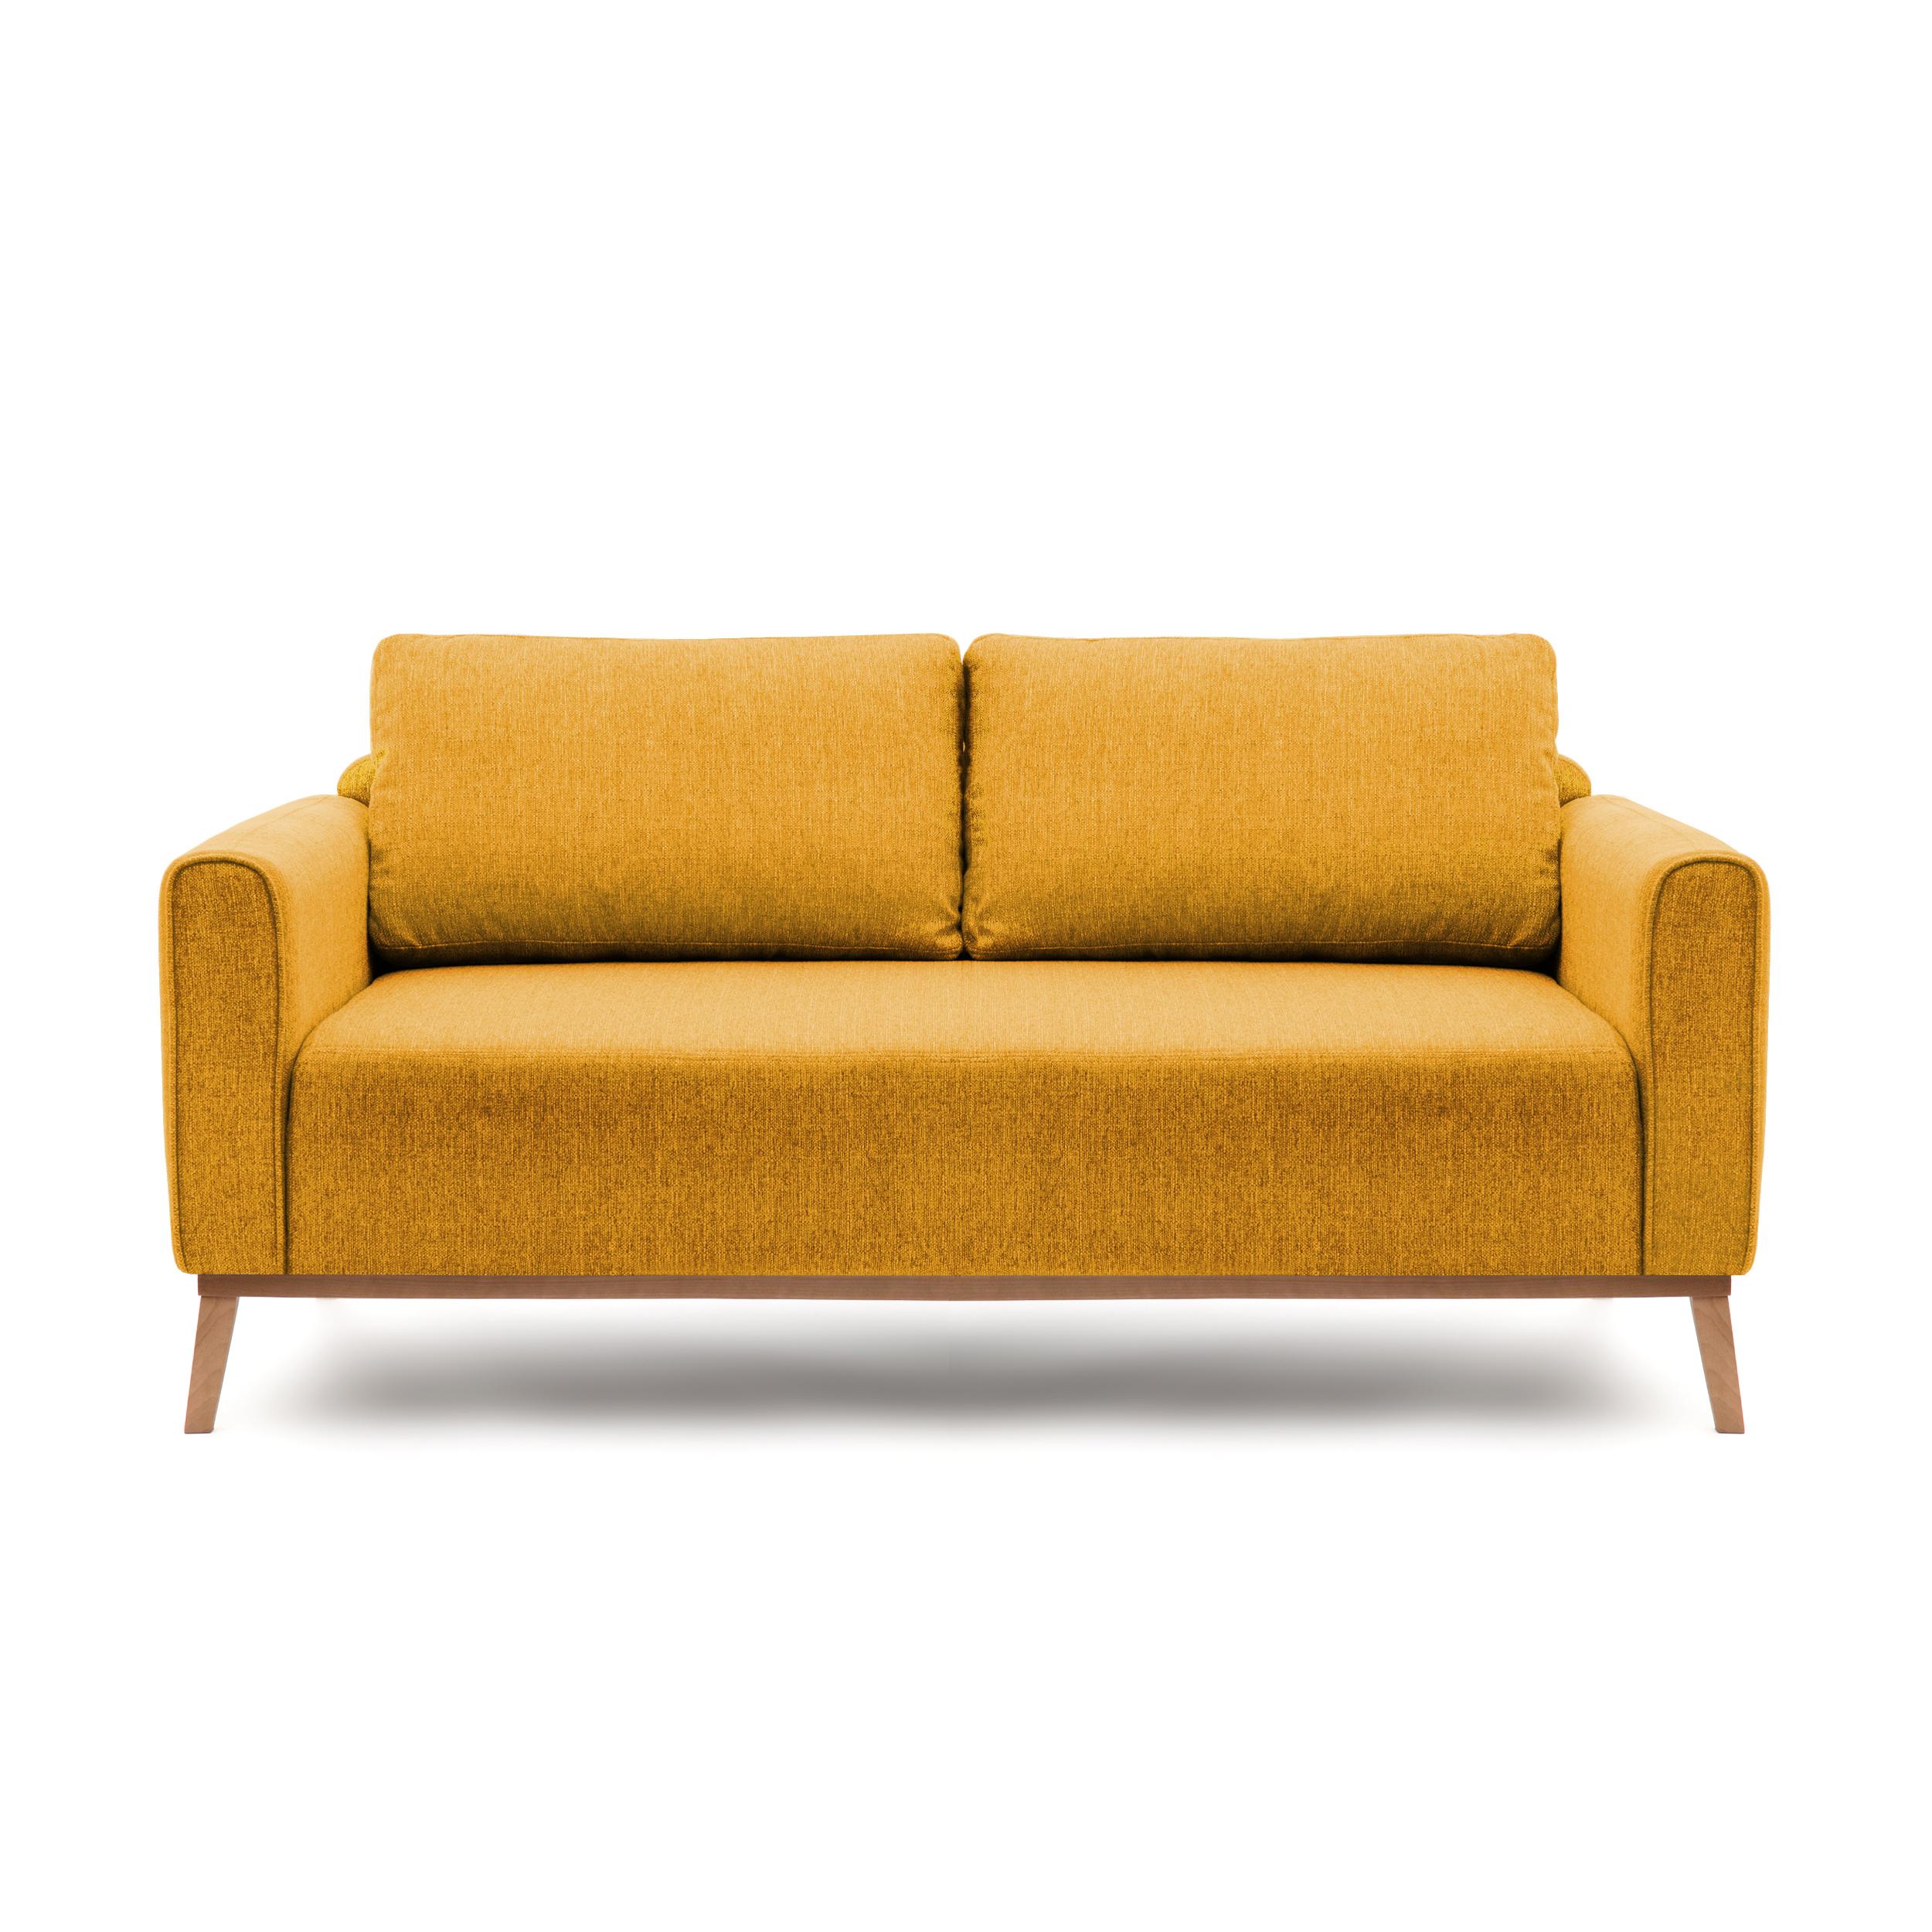 Canapea Fixa 3 locuri Milton Mustard